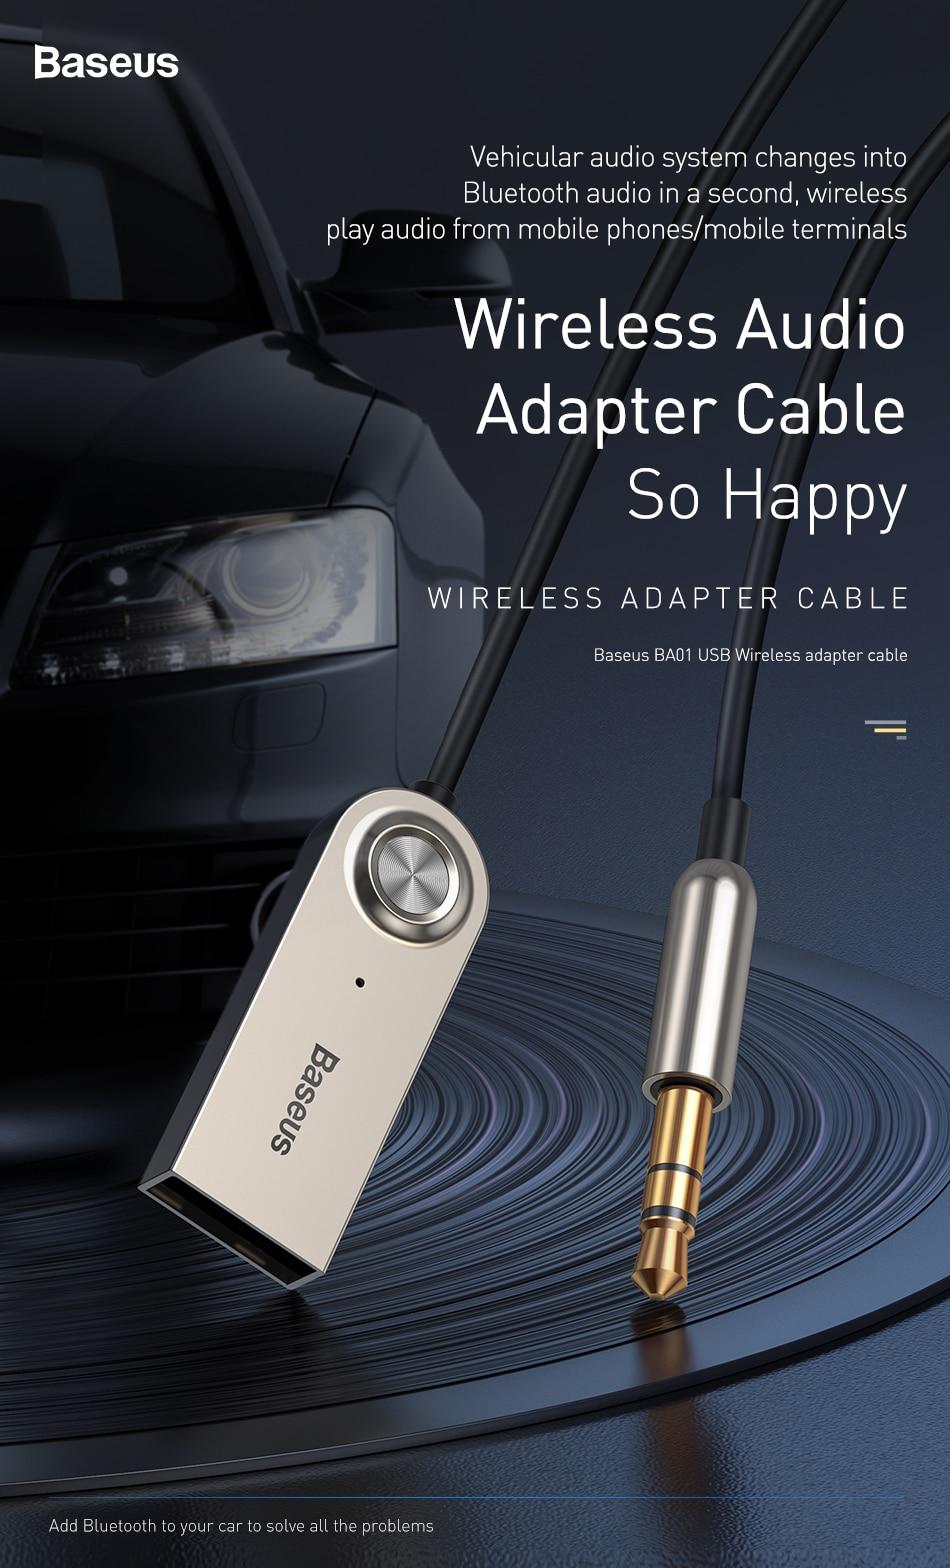 Baseus Ba01 Usb Bluetooth Receiver For Car 3 5 3 5mm Jack Aux Bluetooth 5 0 Adapter Wireless Audio Music Bluetooth Transmitter Wireless Adapter Aliexpress